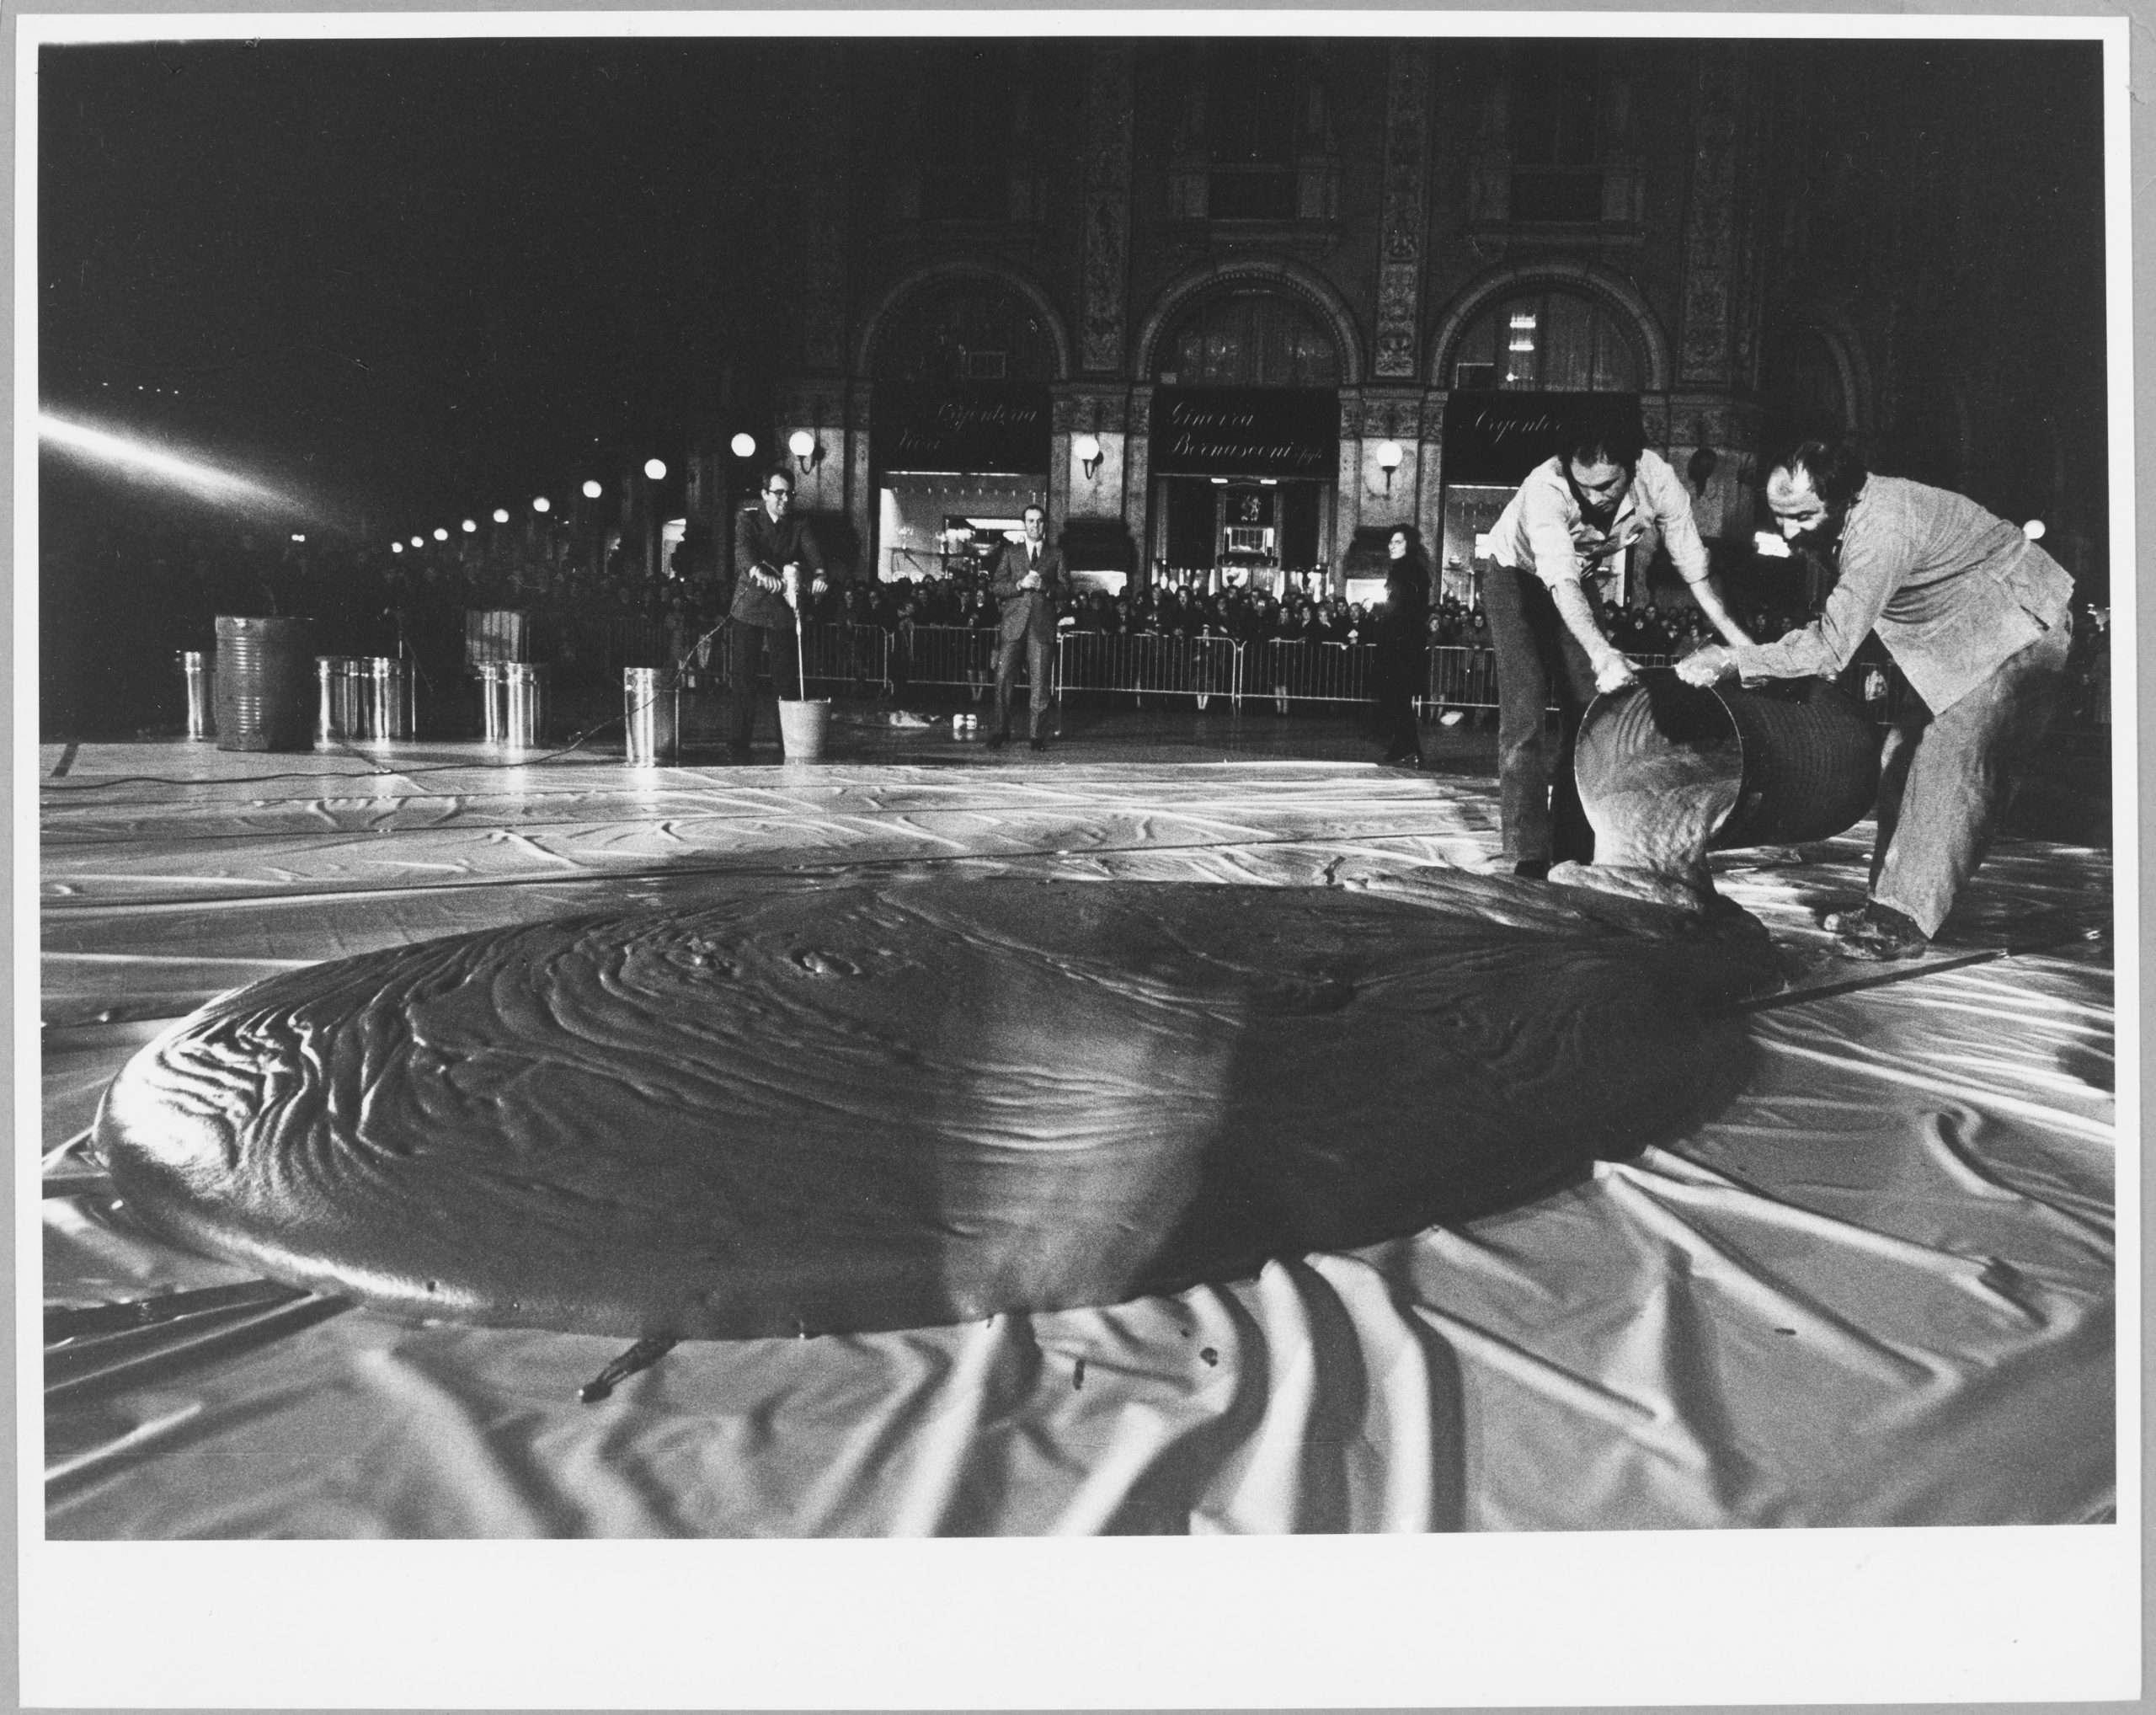 13. Shunk-Kender_Jean Tinguely, Monument Ö la fertilitÇ devant le Duomo, Milano, 1970